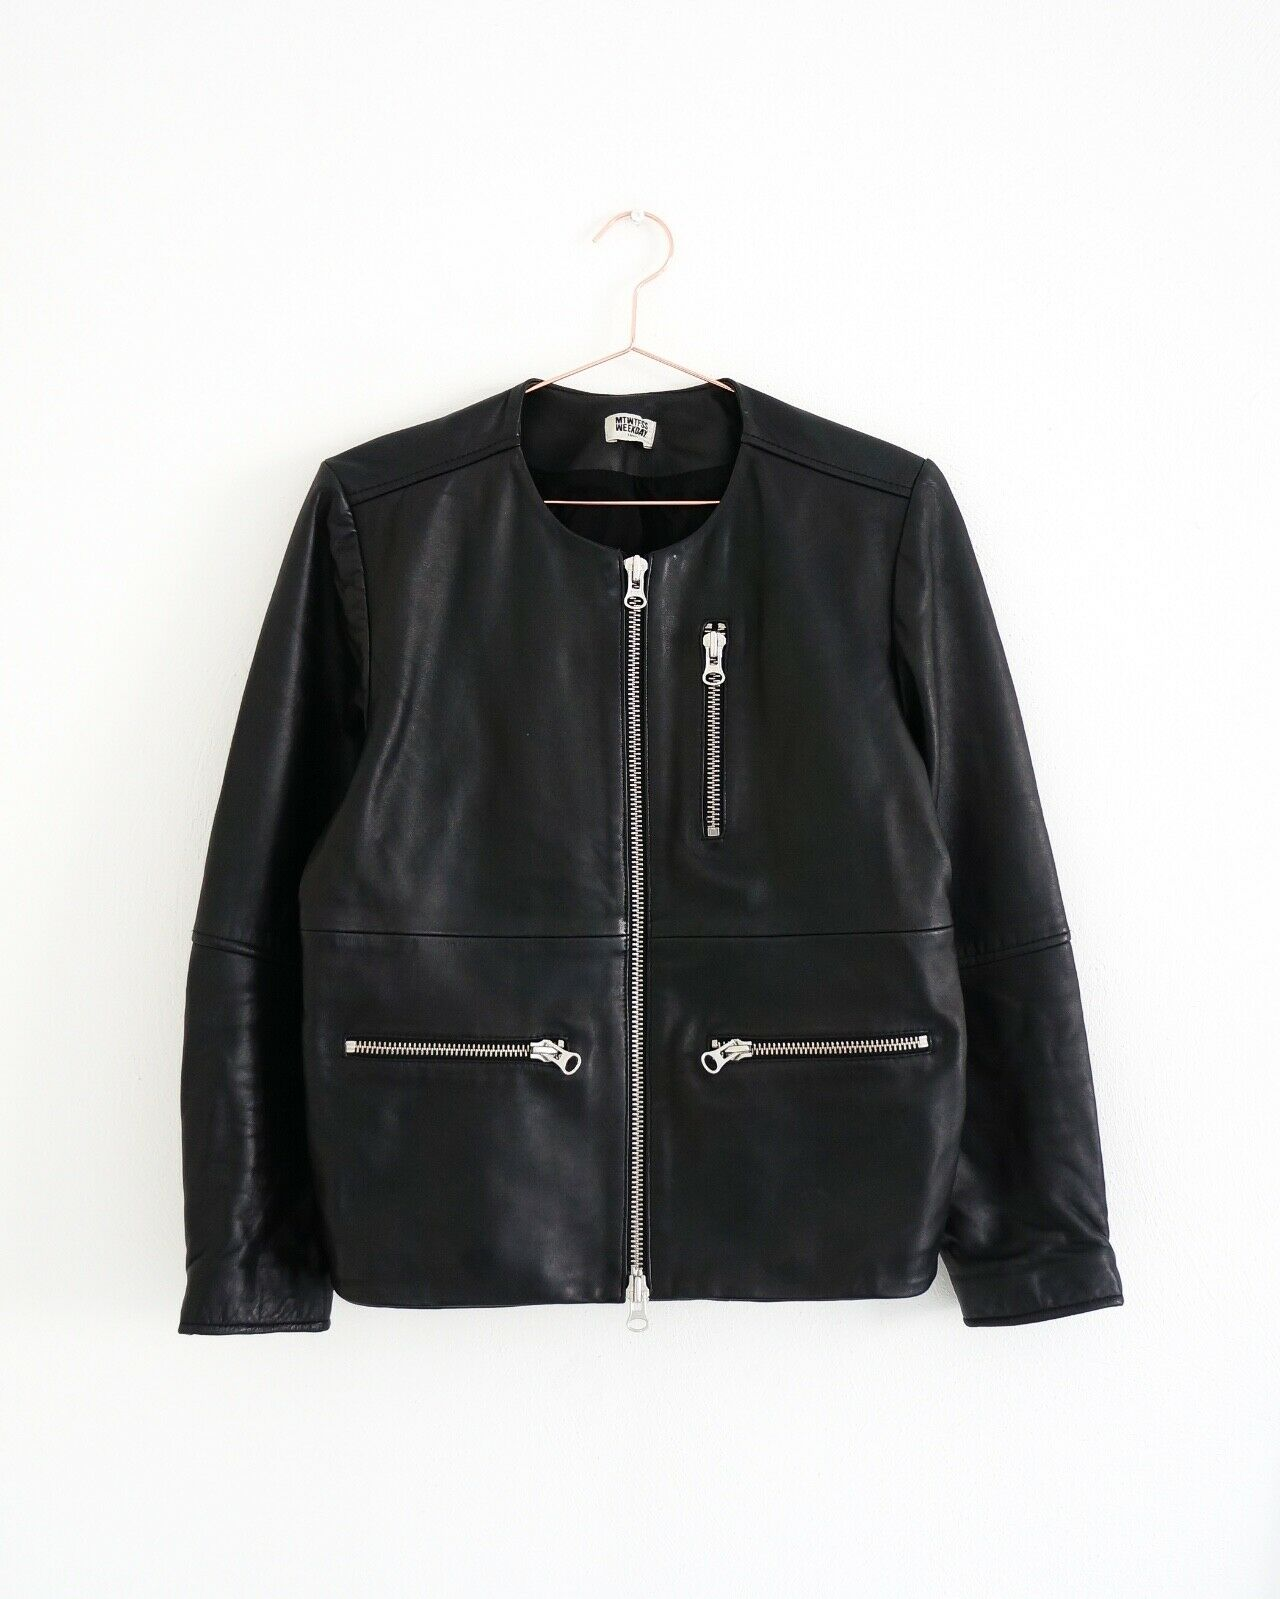 HOF115  Weekday PC Coco Jacket leather schwarz   Jacke echt leder biker schwarz S